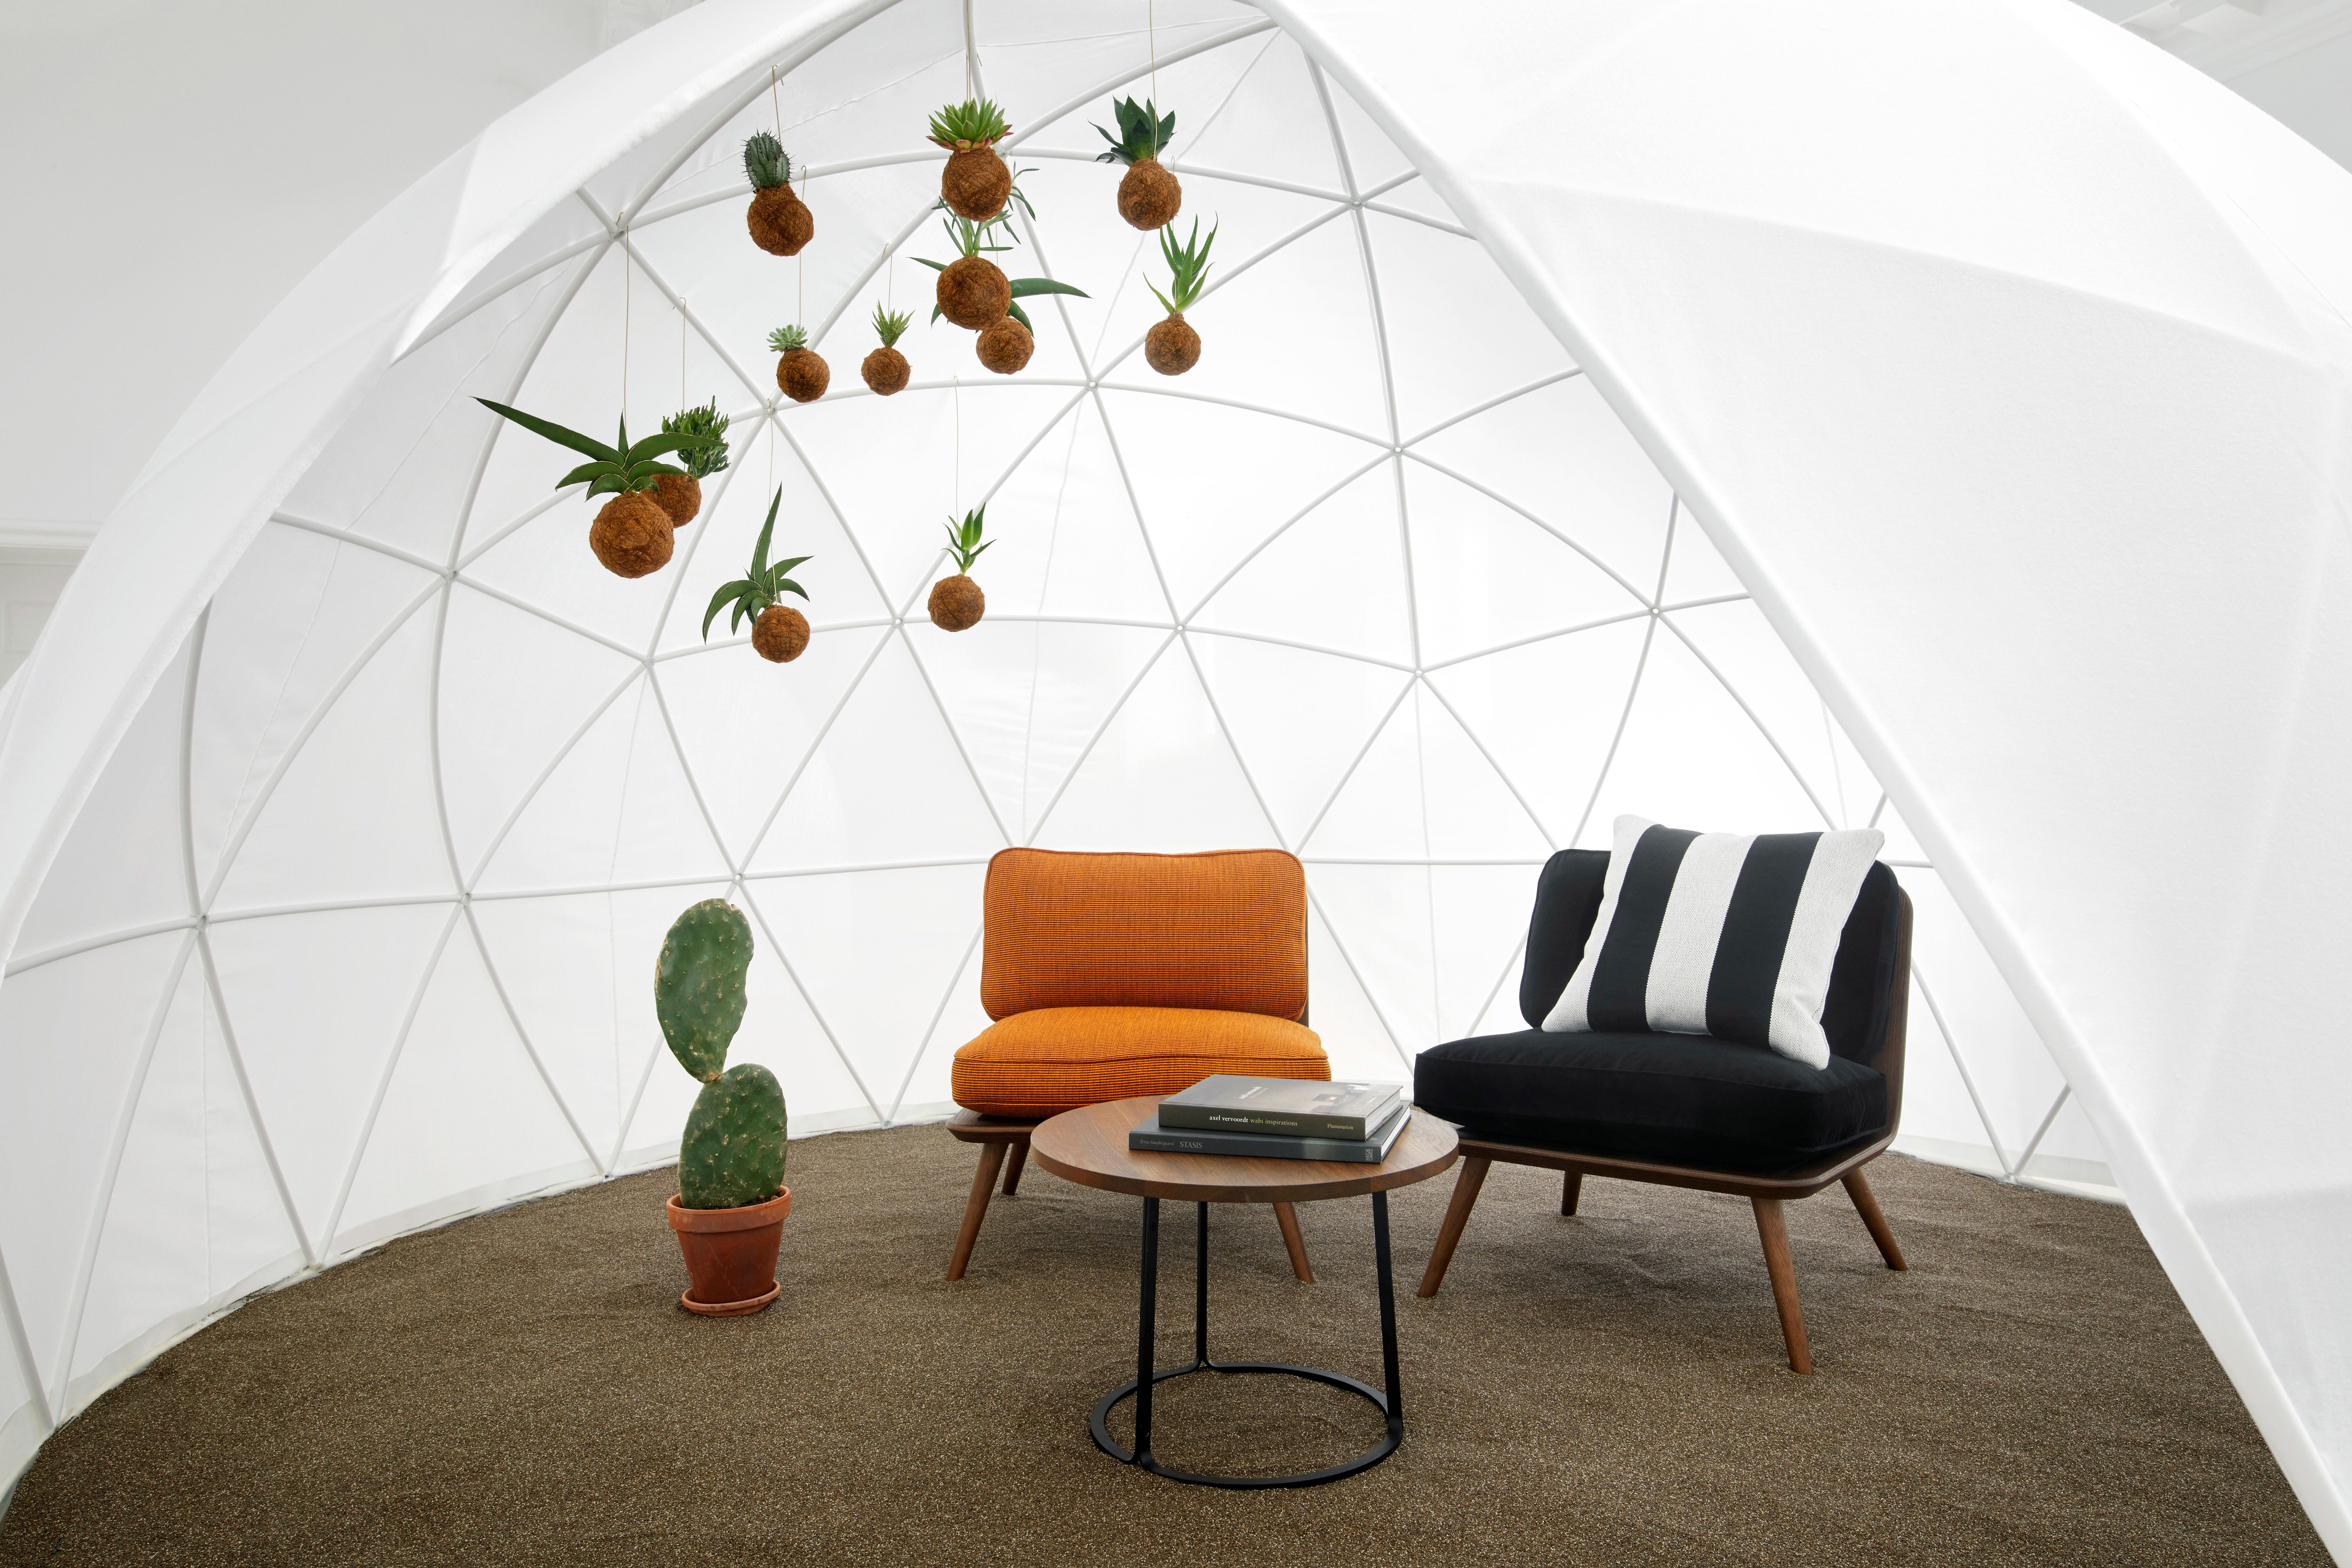 decoration home simons furniture decor fashions accessories cupboard pin